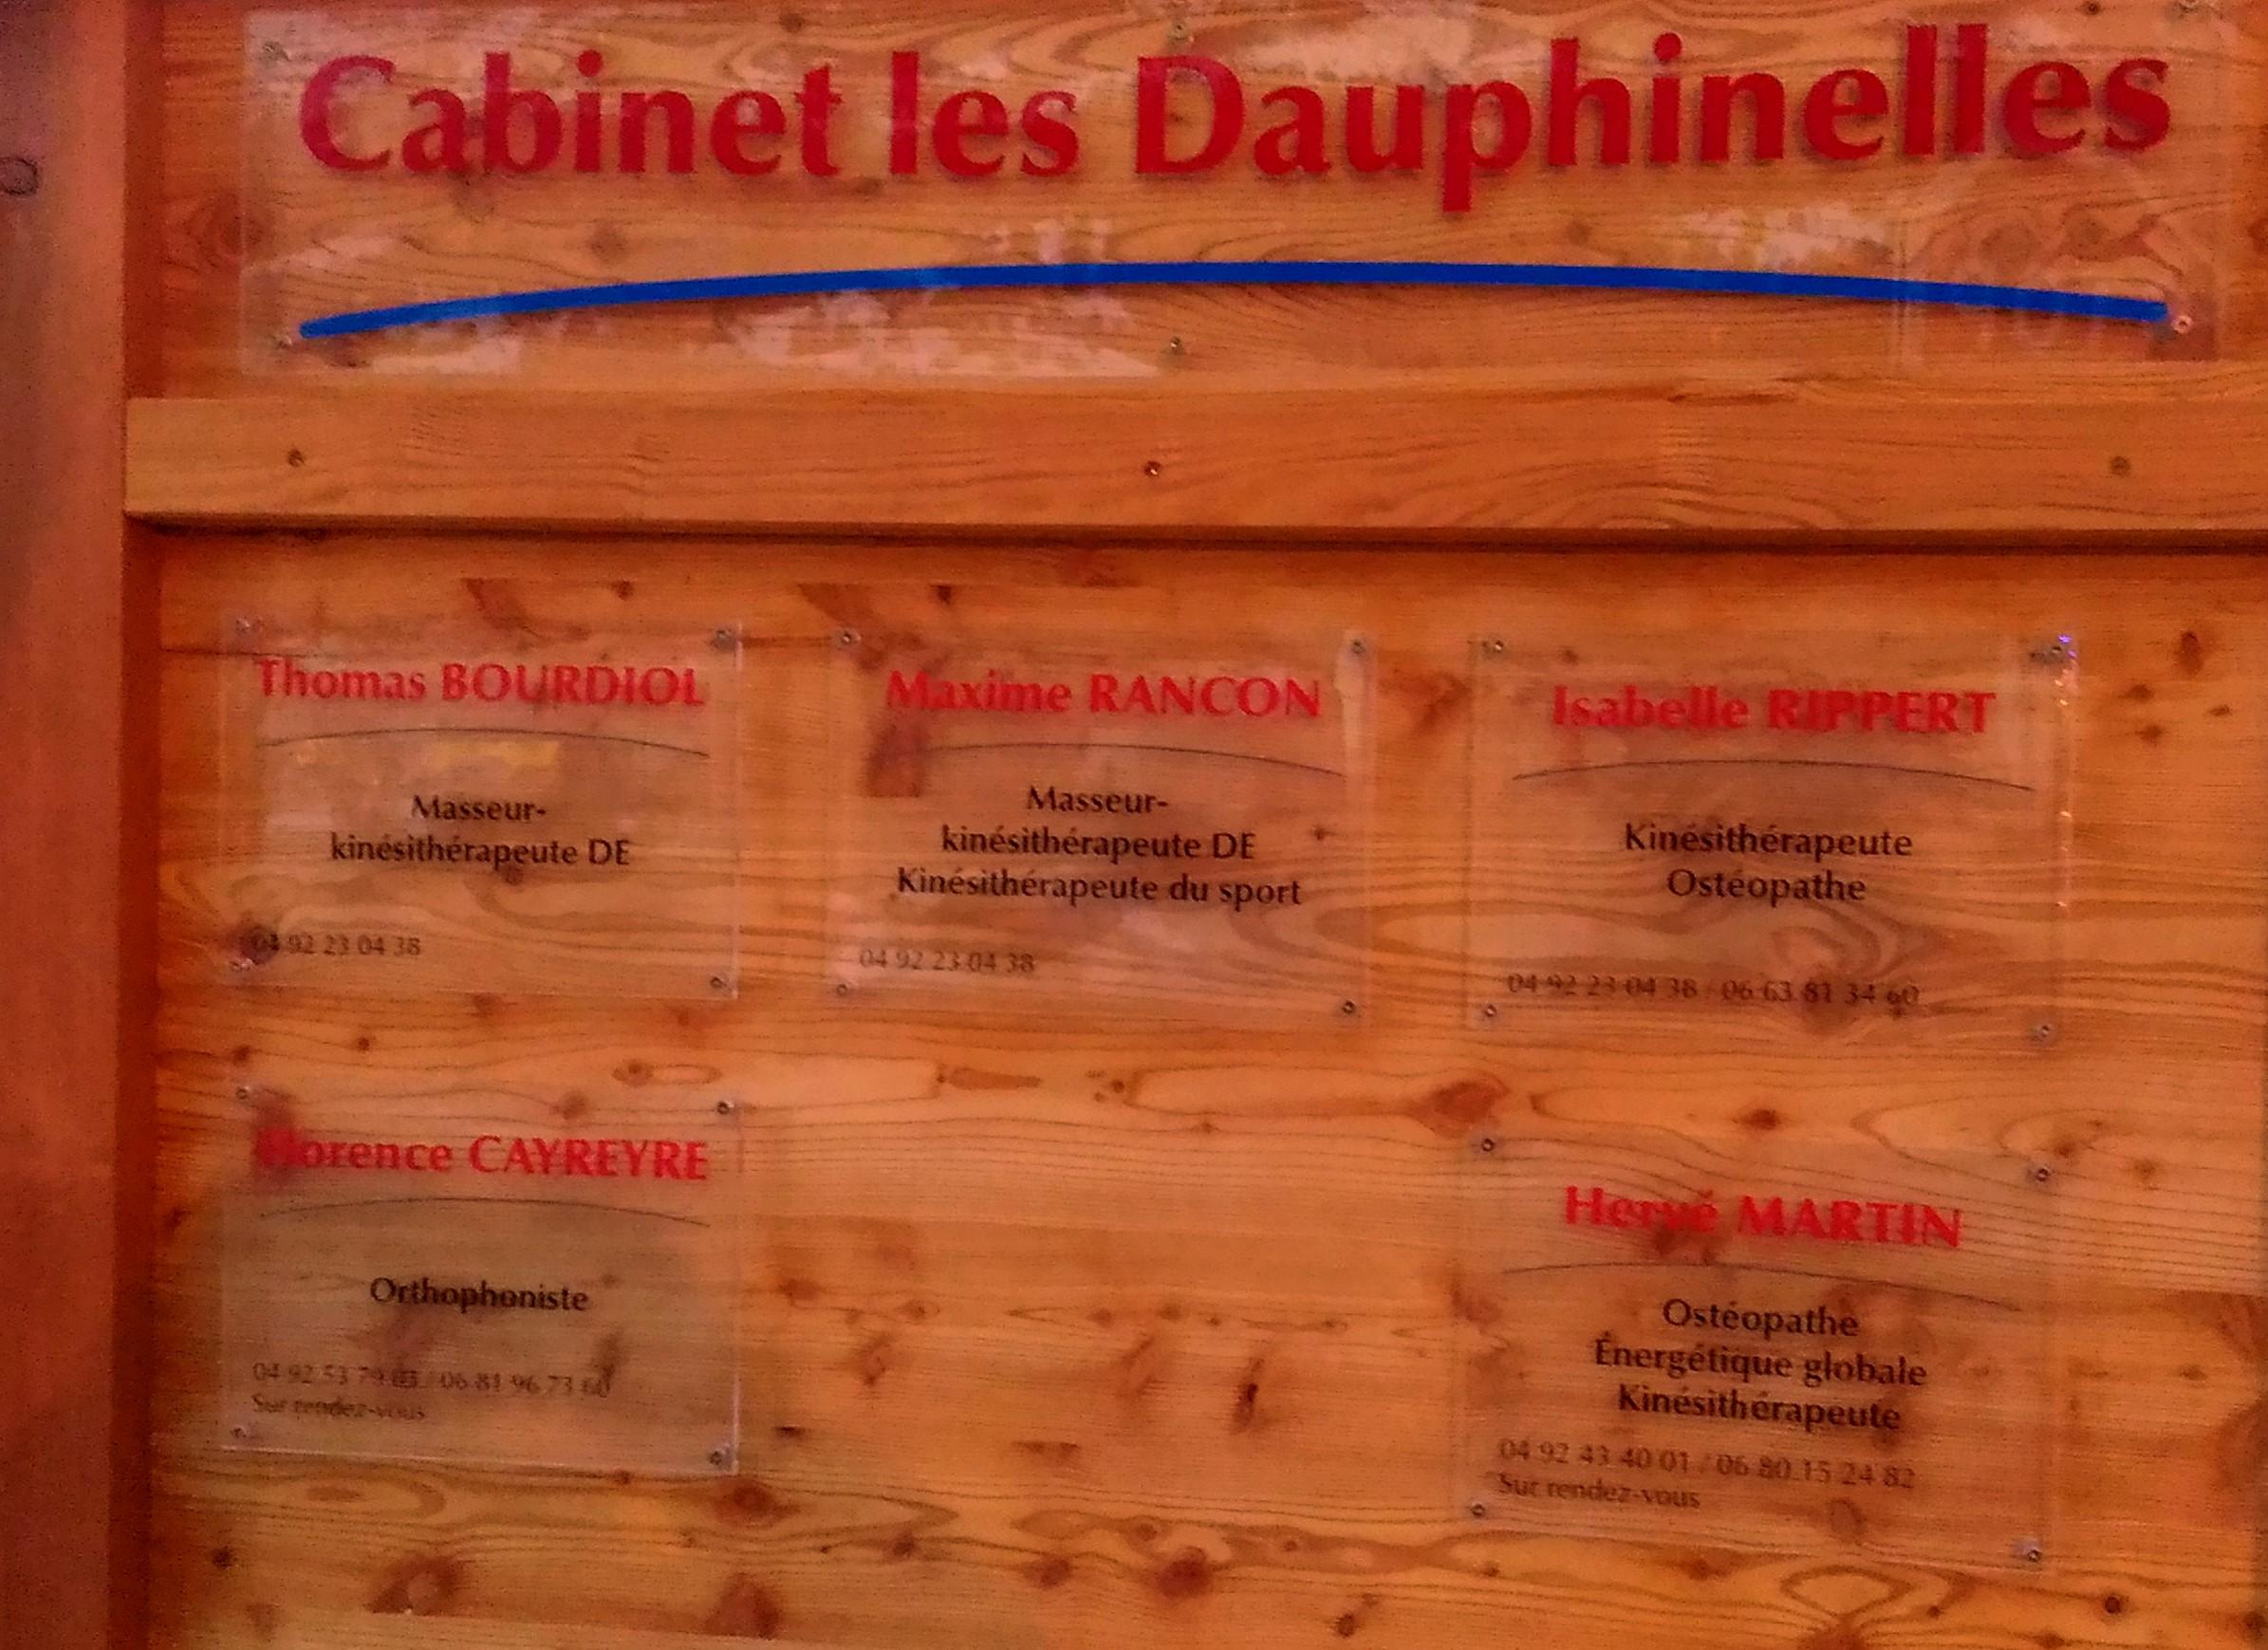 Ost opathie nerg tique globale herv martin l - Office du tourisme l argentiere la bessee ...